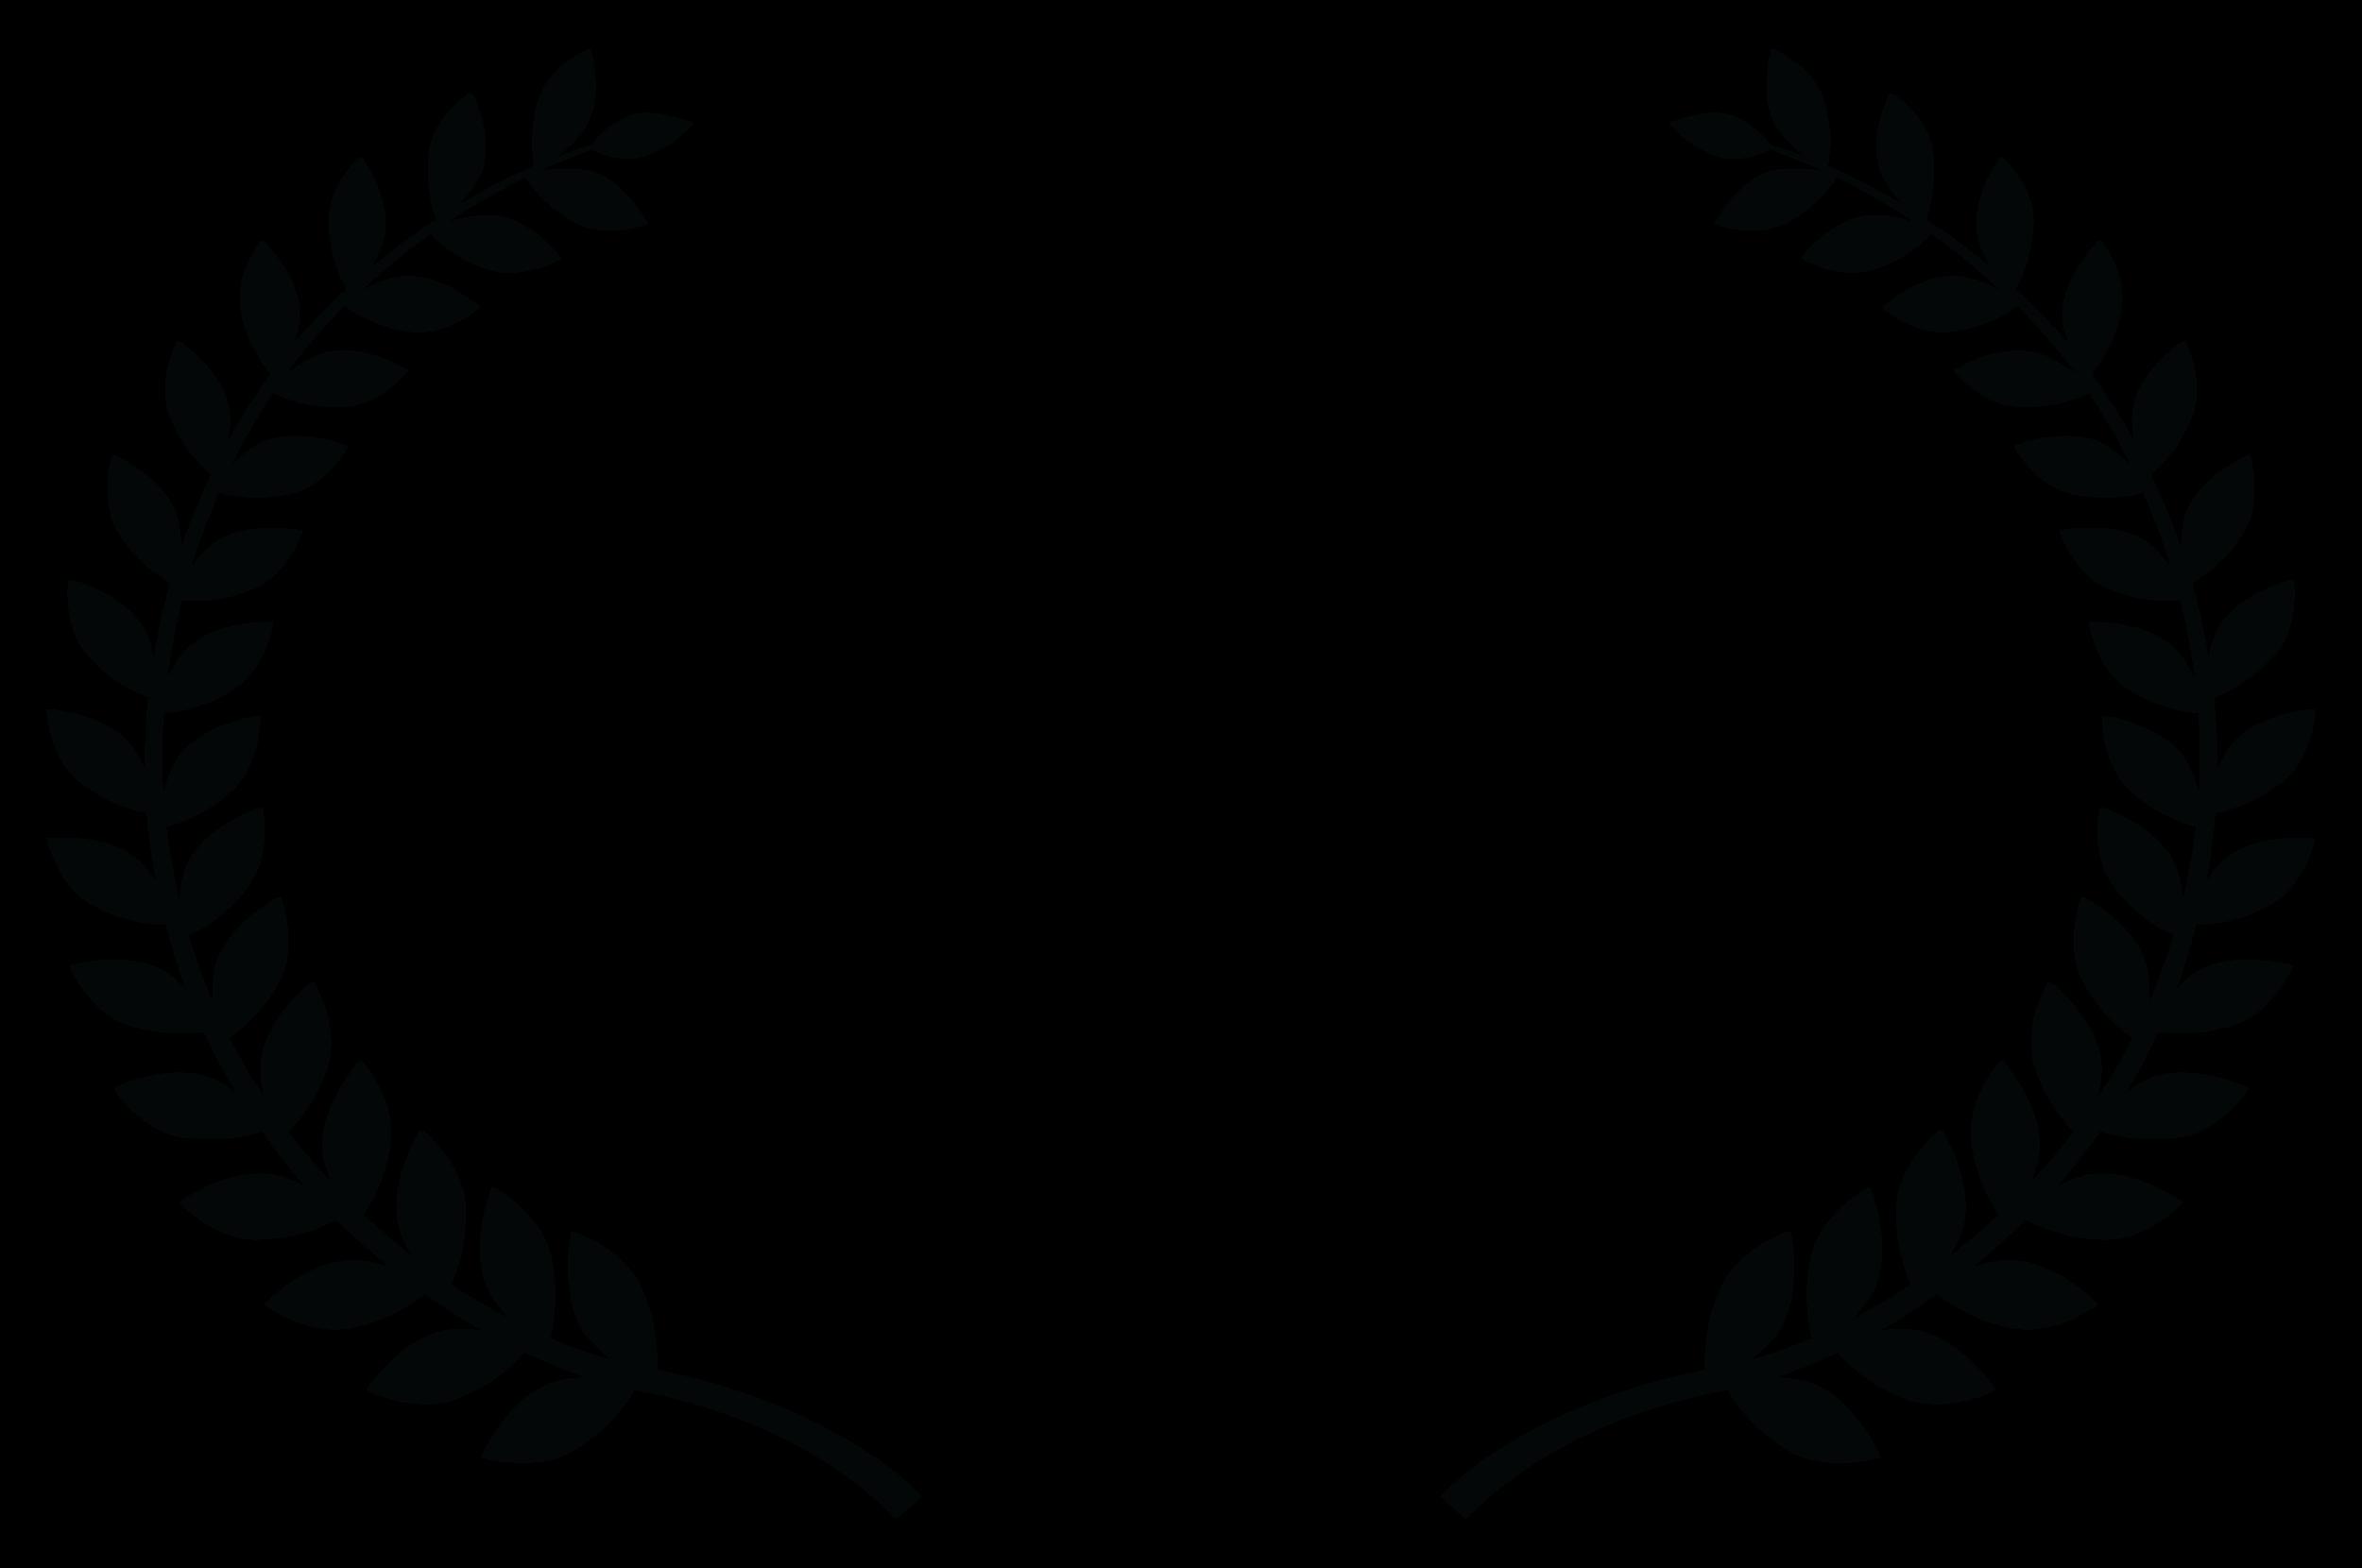 OFFICIALSELECTION-TheFilmCollective.-2018.png